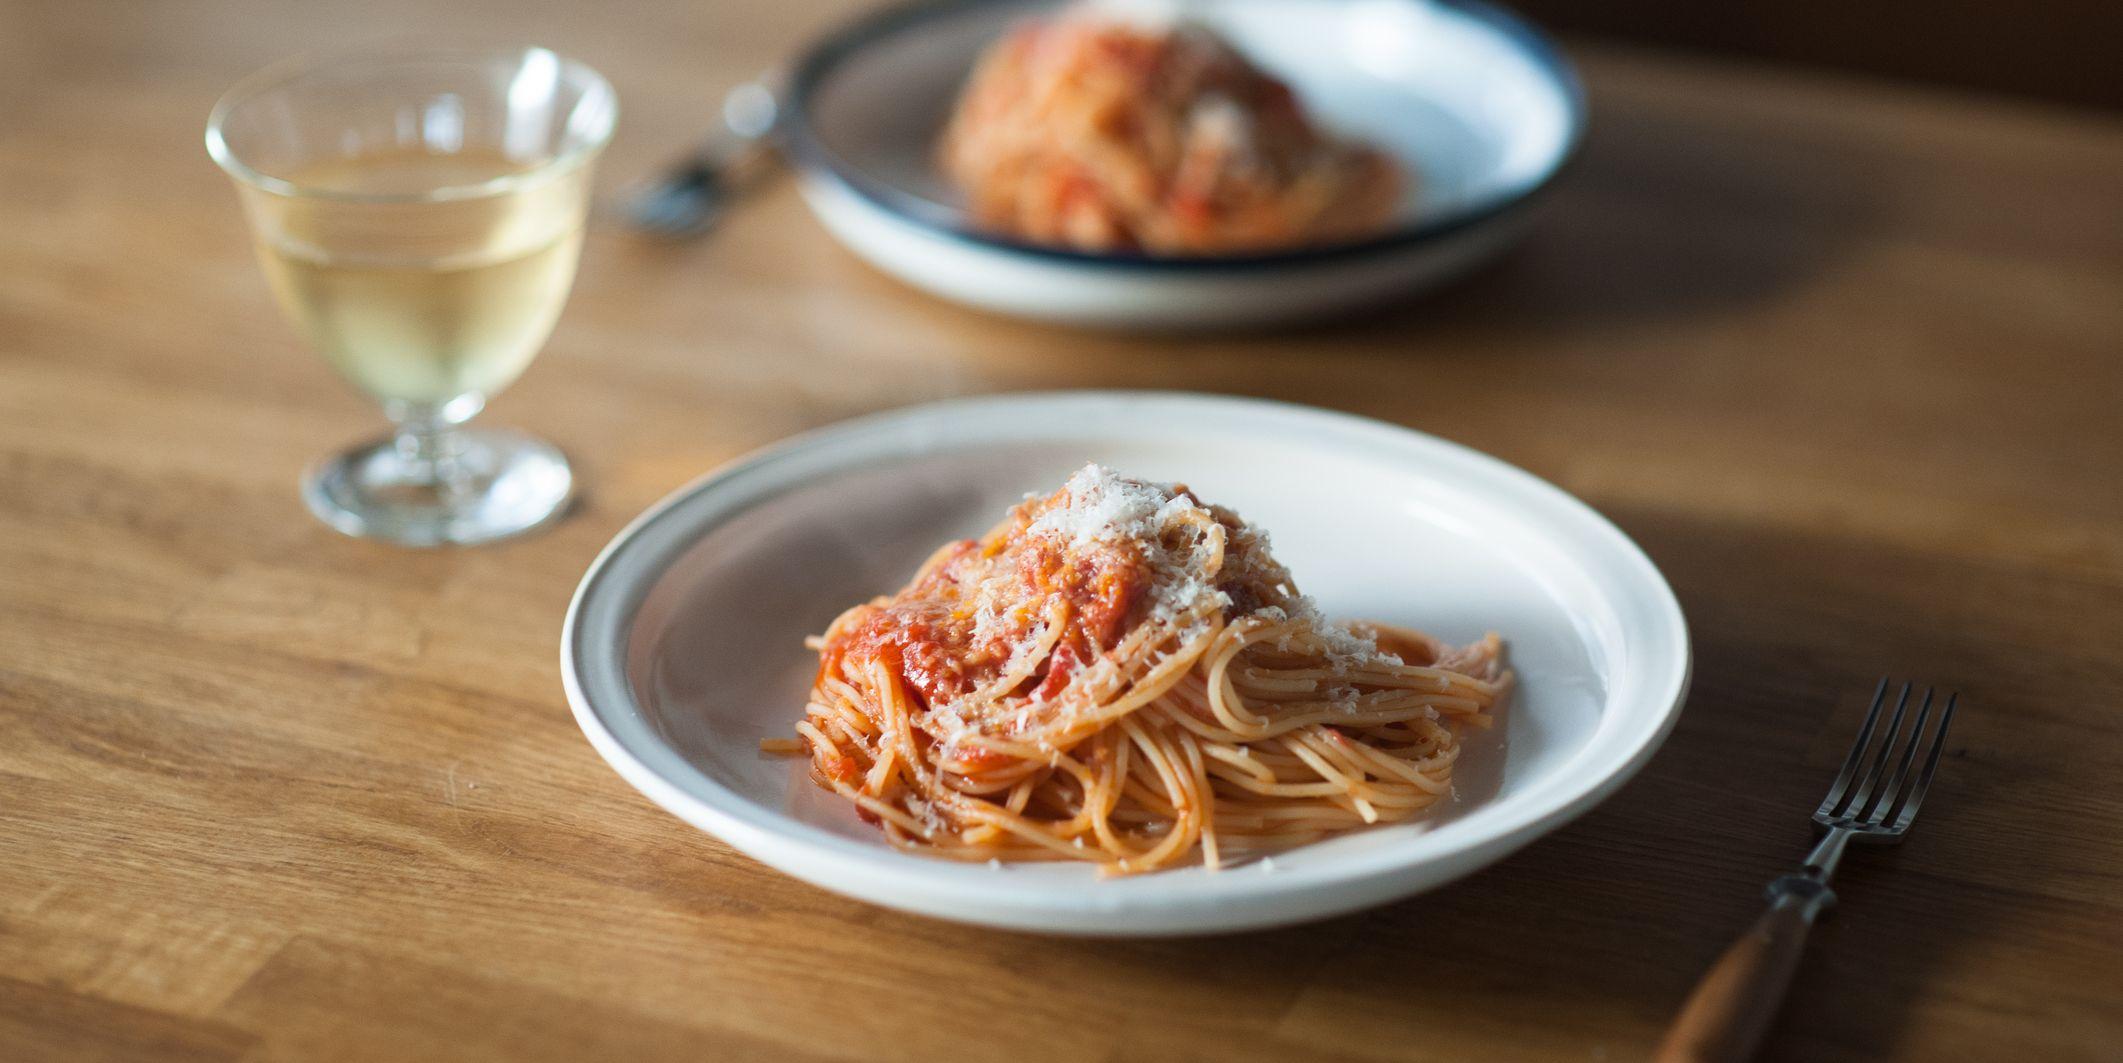 Tomato sauce spaghetti with parmesan cheese